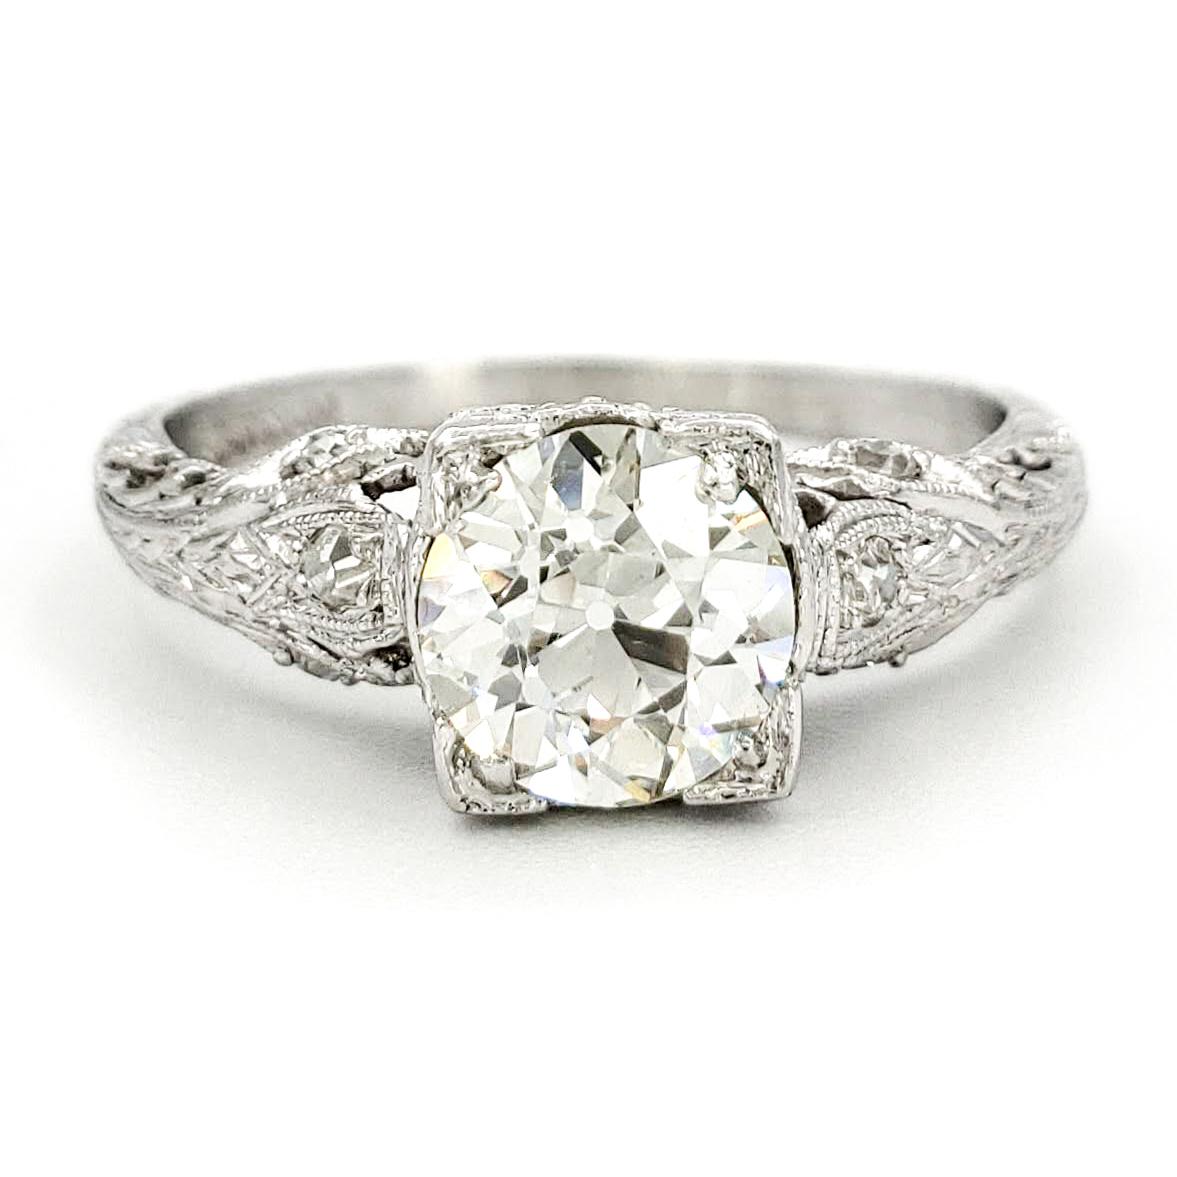 vintage-platinum-engagement-ring-with-1-08-carat-old-european-cut-diamond-egl-g-vs2